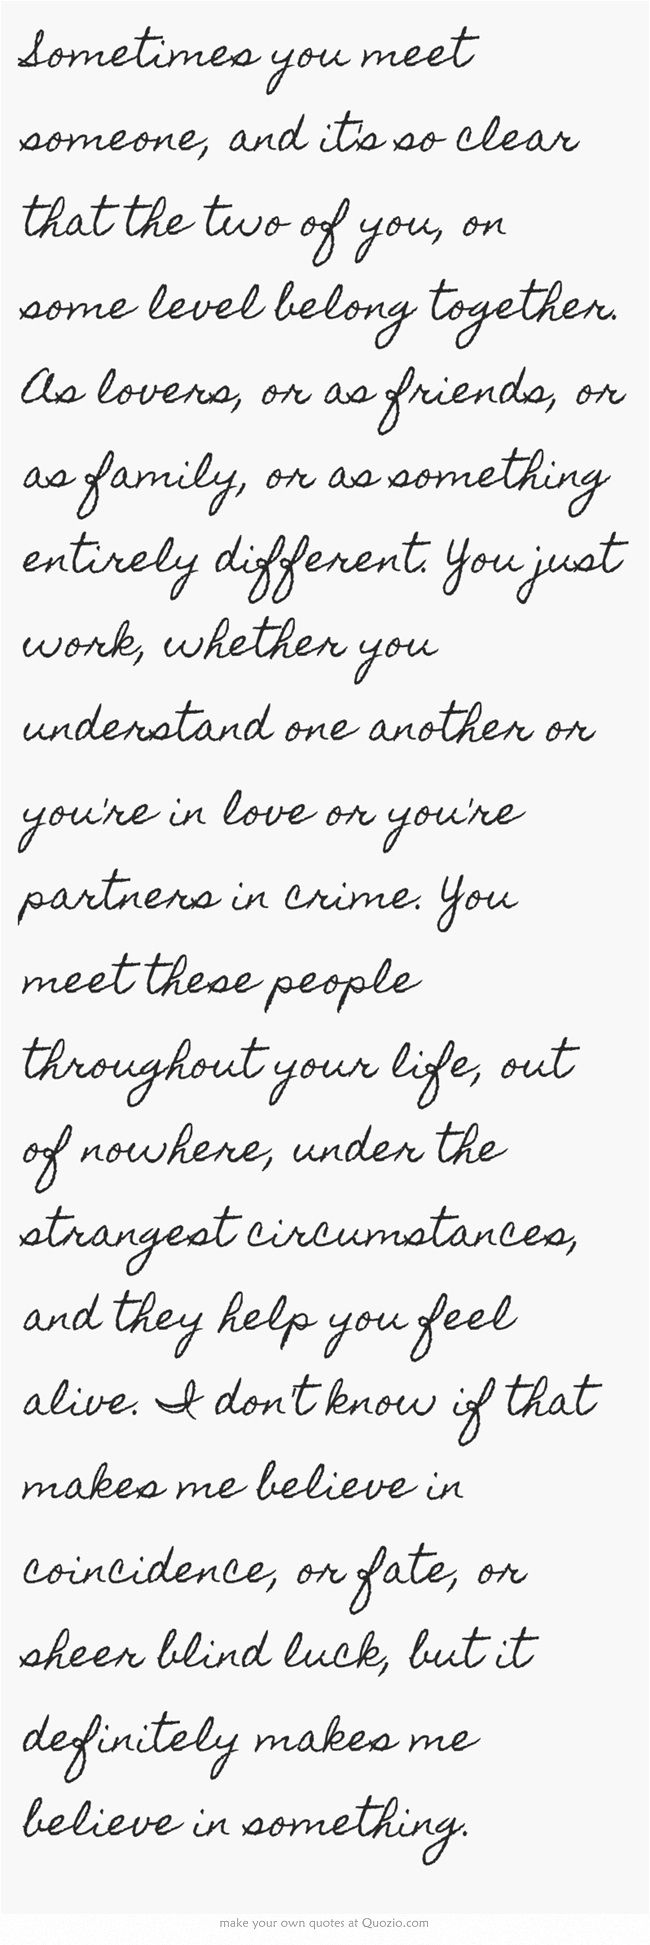 Sometimes you meet someone...